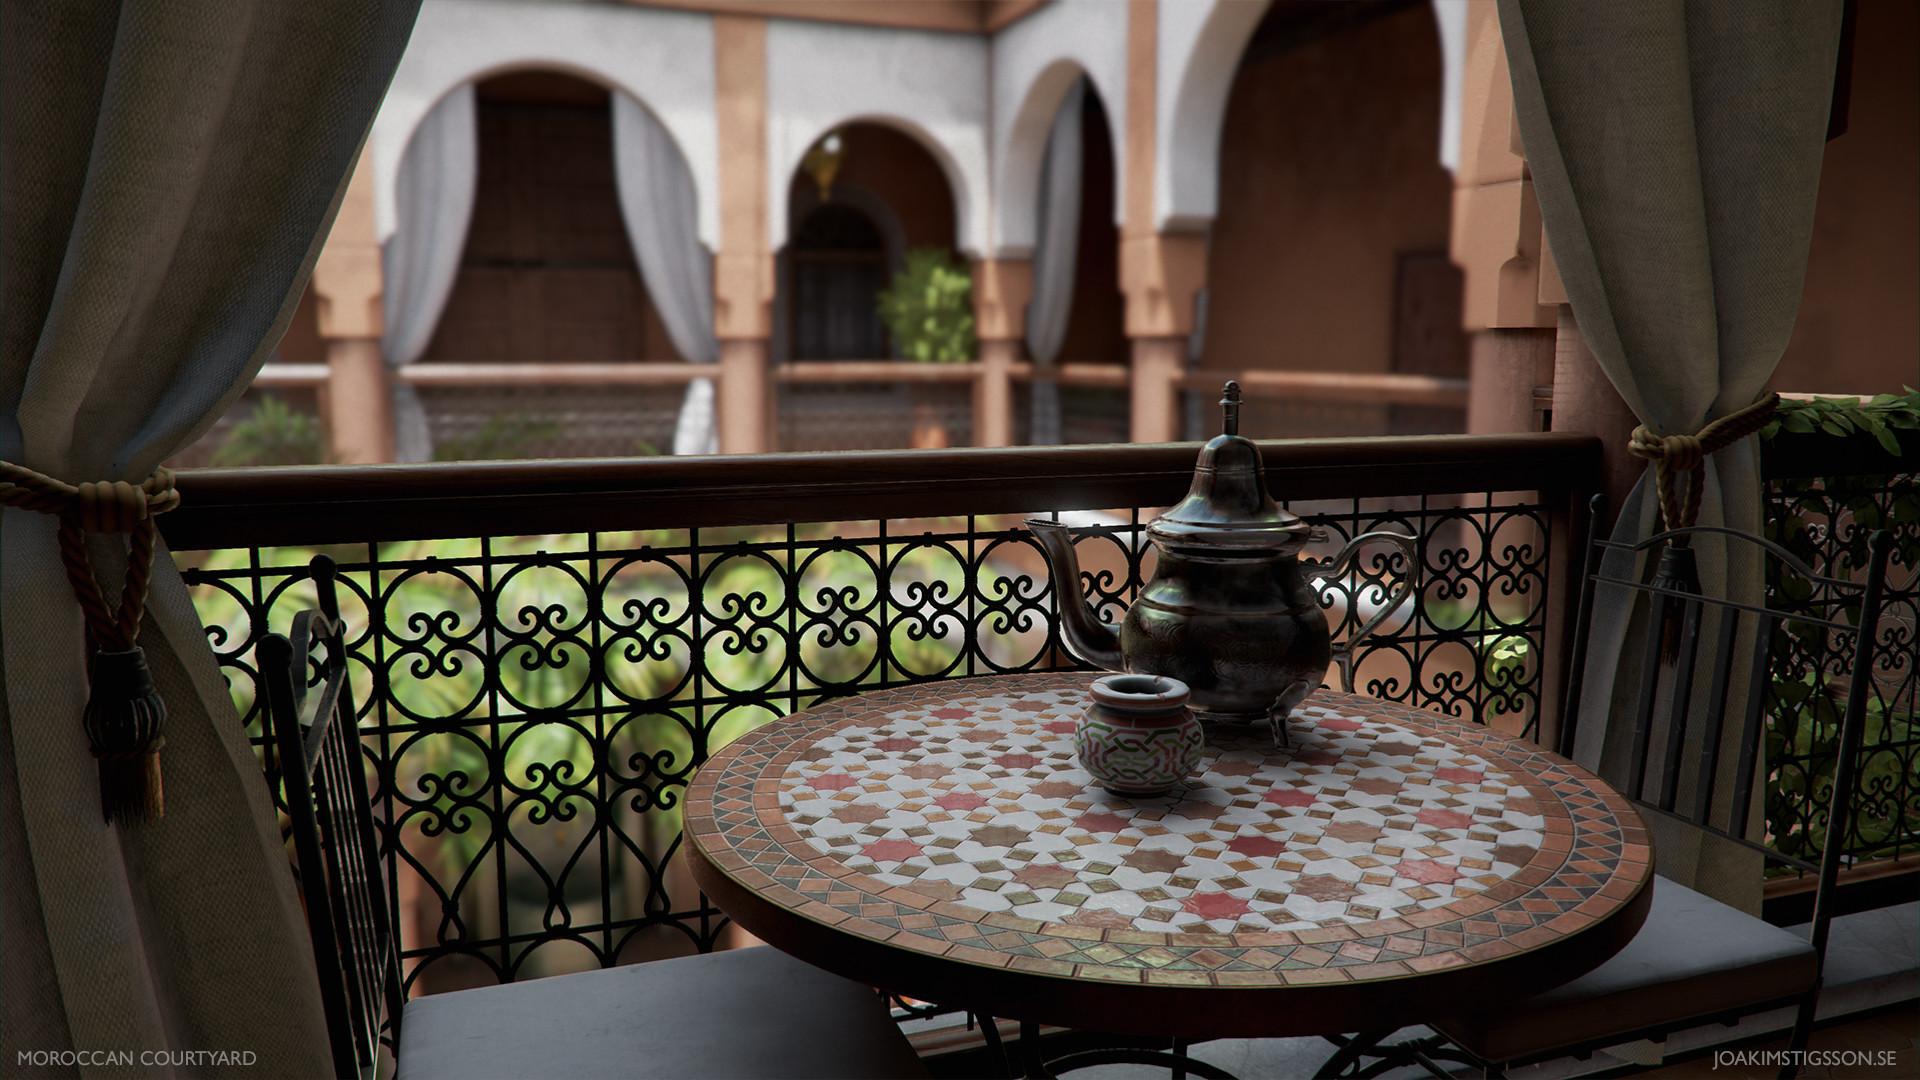 Joakim stigsson moroccan courtyard 02